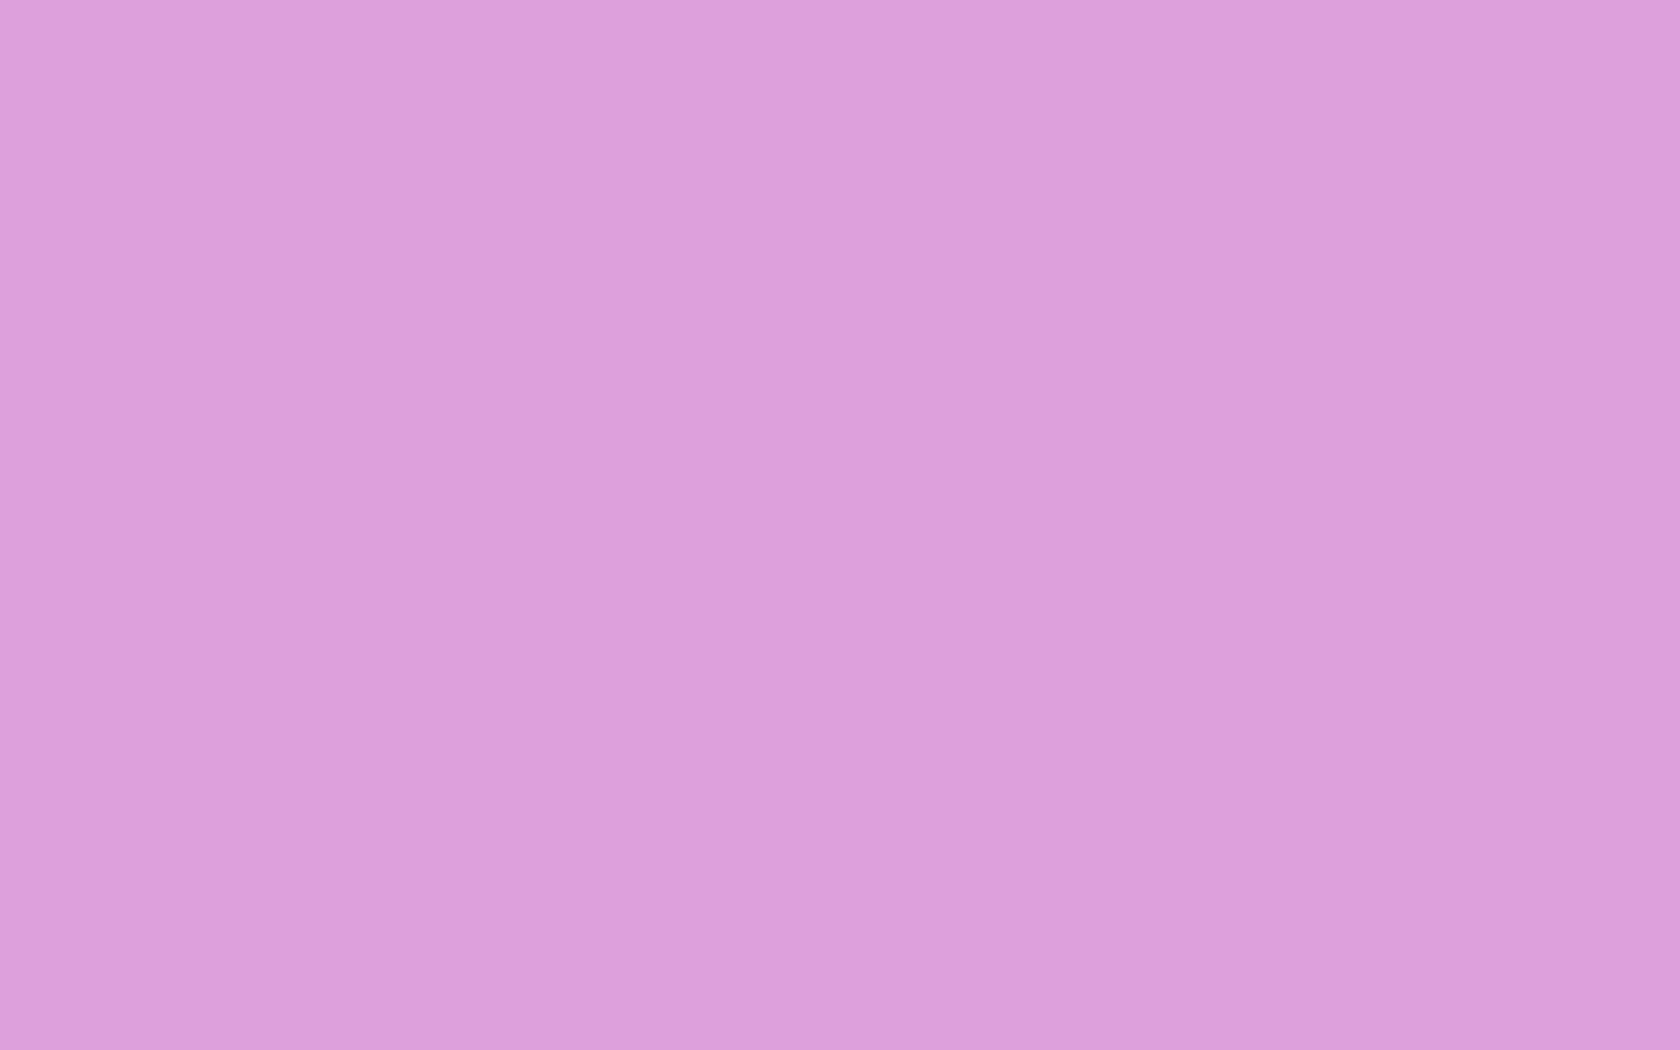 1680x1050 Pale Plum Solid Color Background